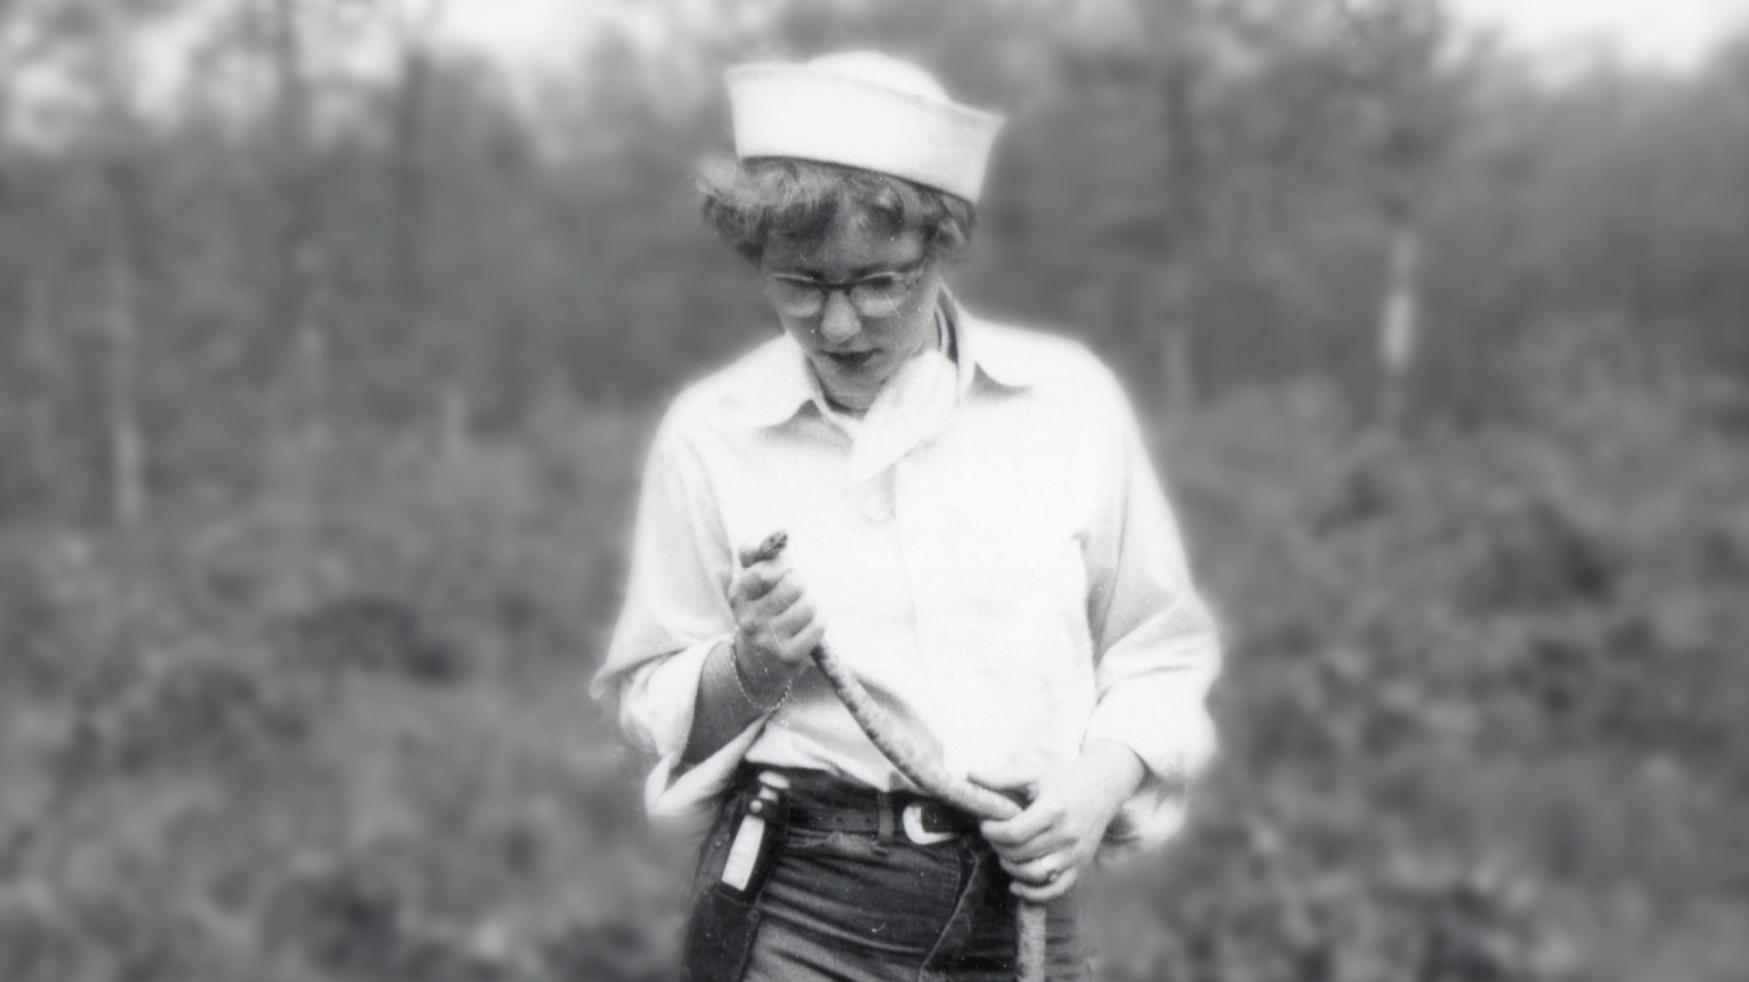 Joanne Martin holding a snake